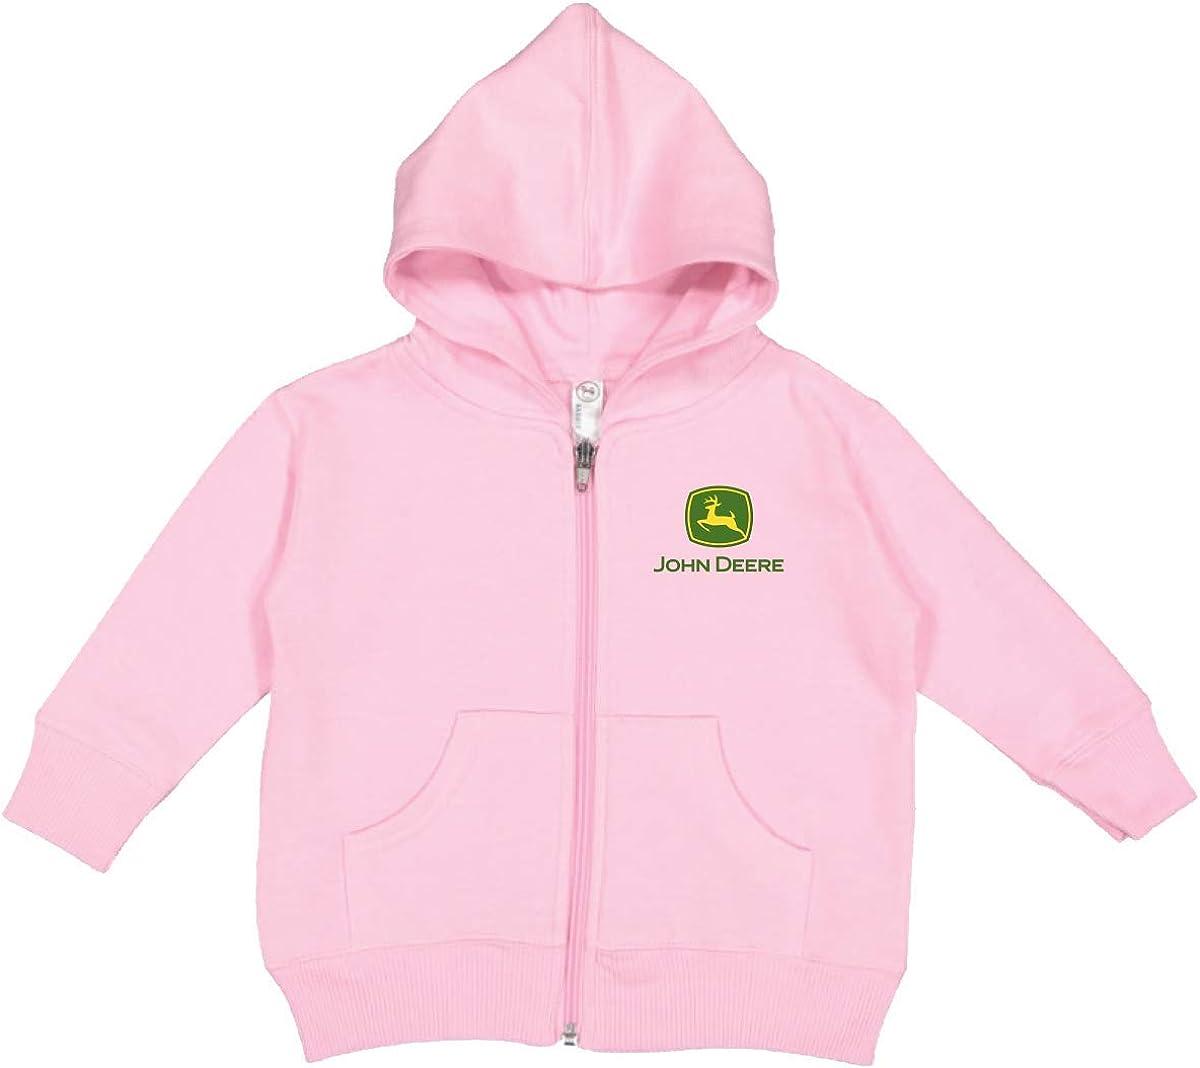 John Deere Logo Baby Girl Pink Gorgeous Hooded Purchase Full Zip Sweatshirtight